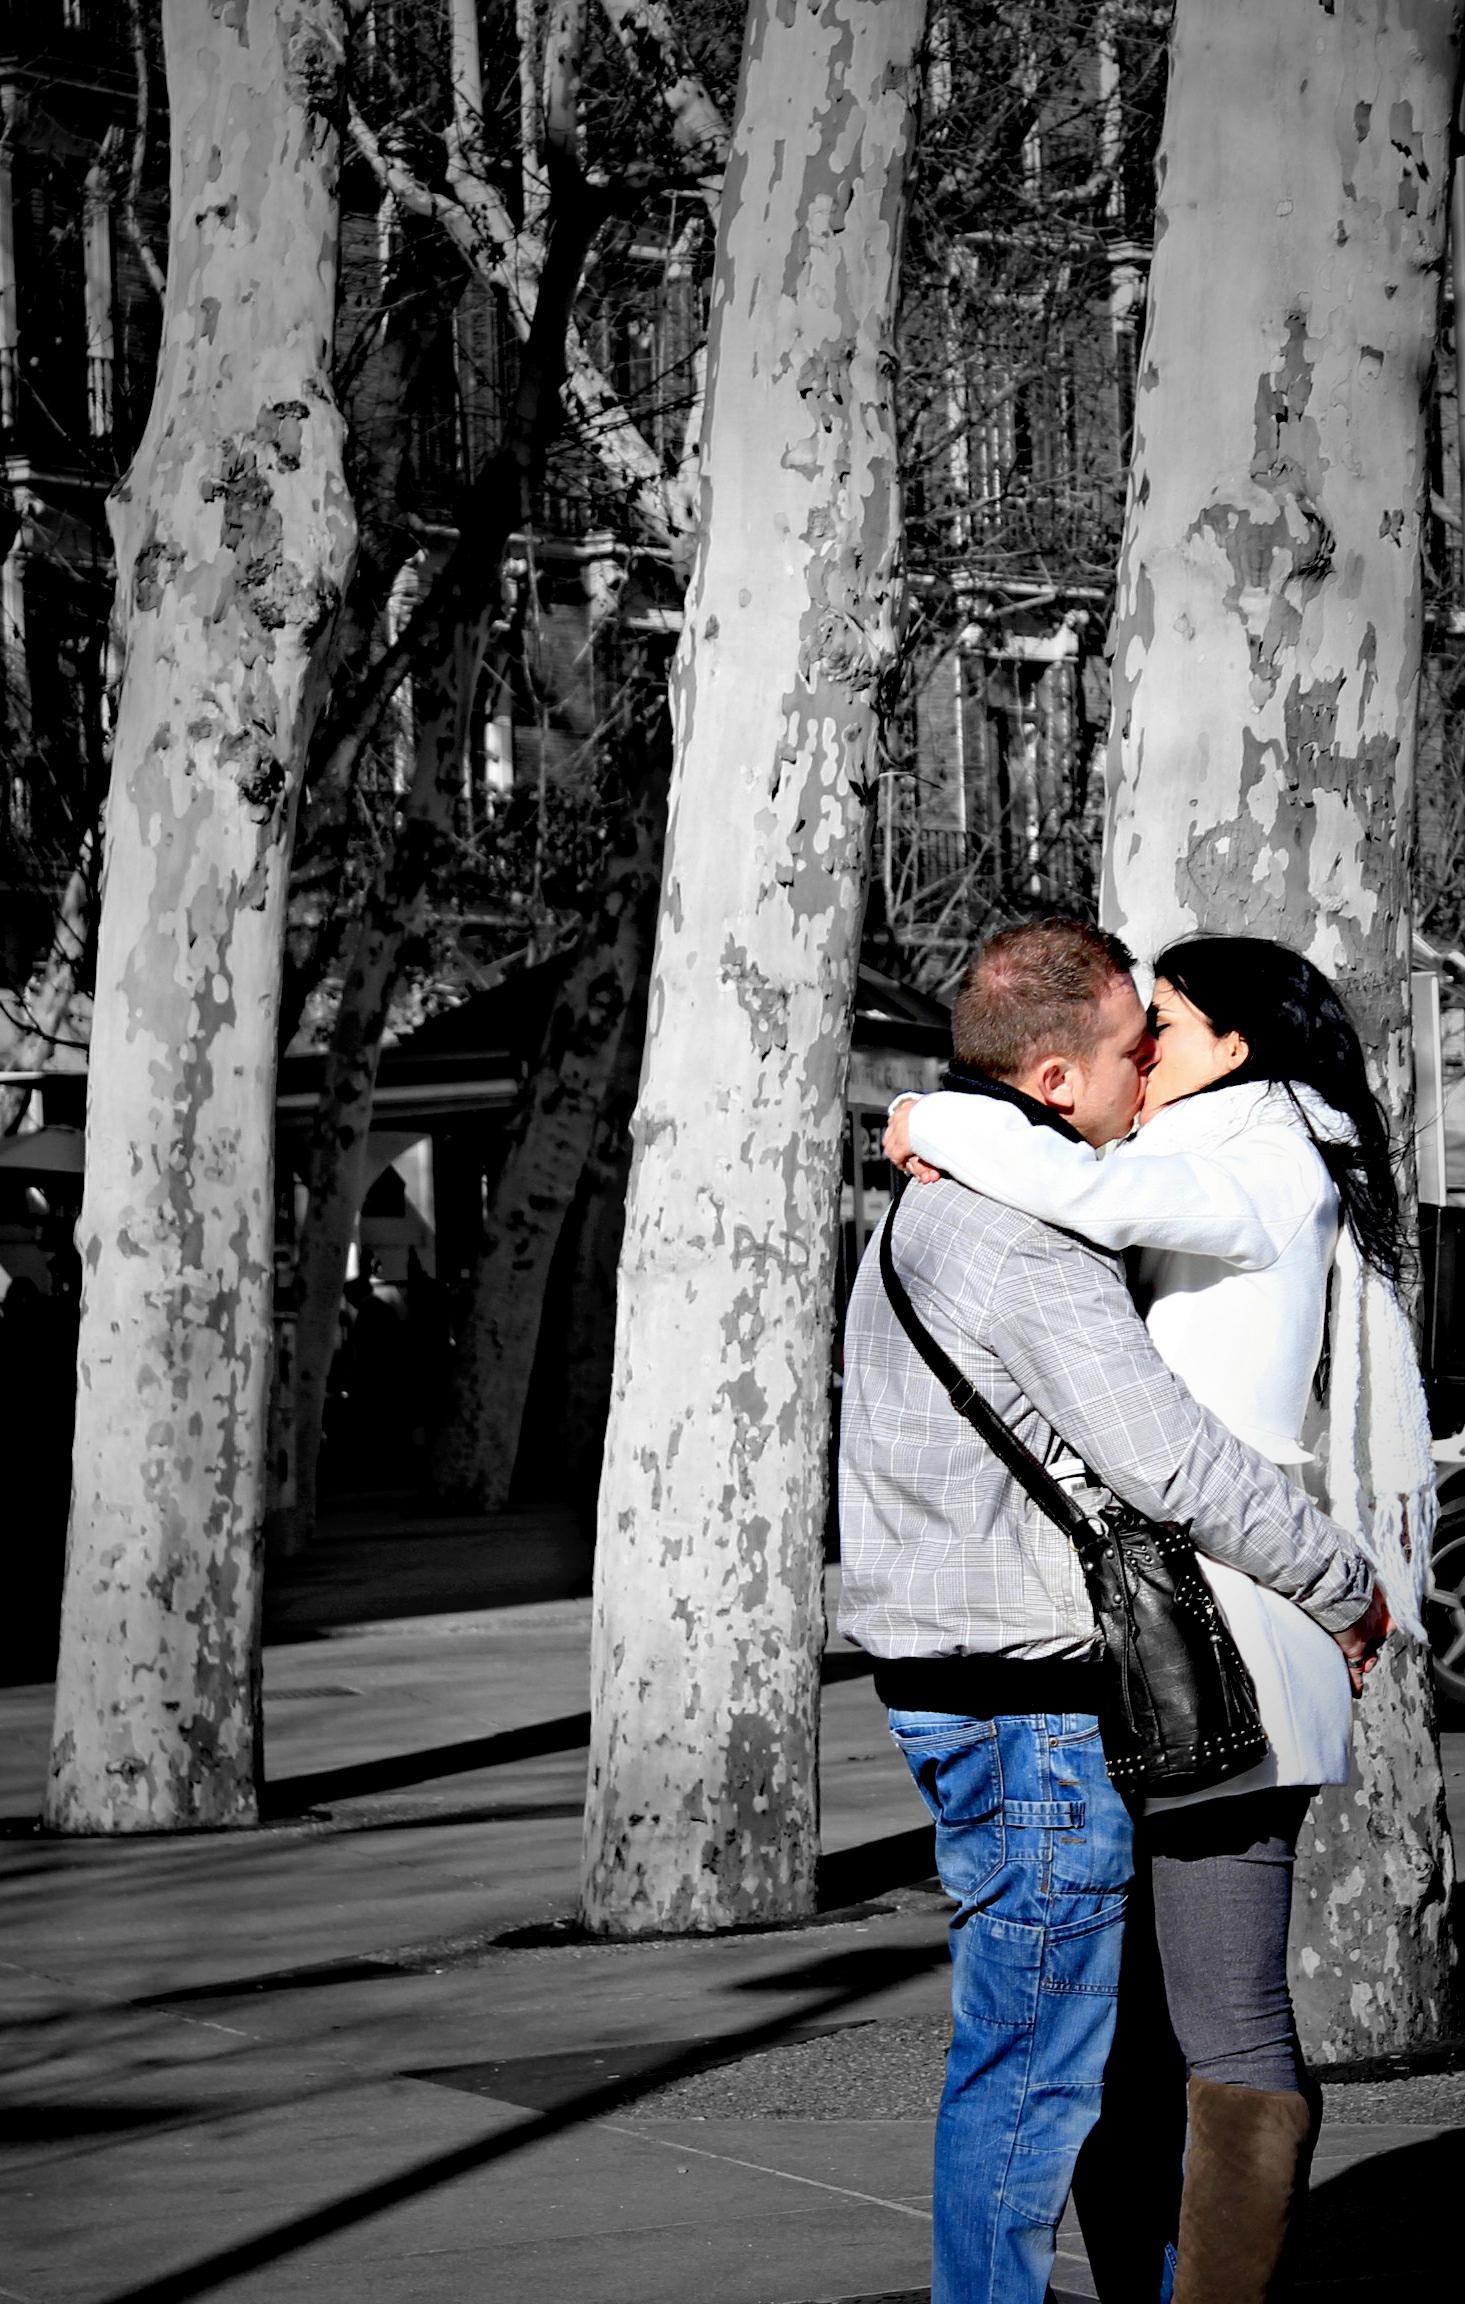 kissspain.jpg